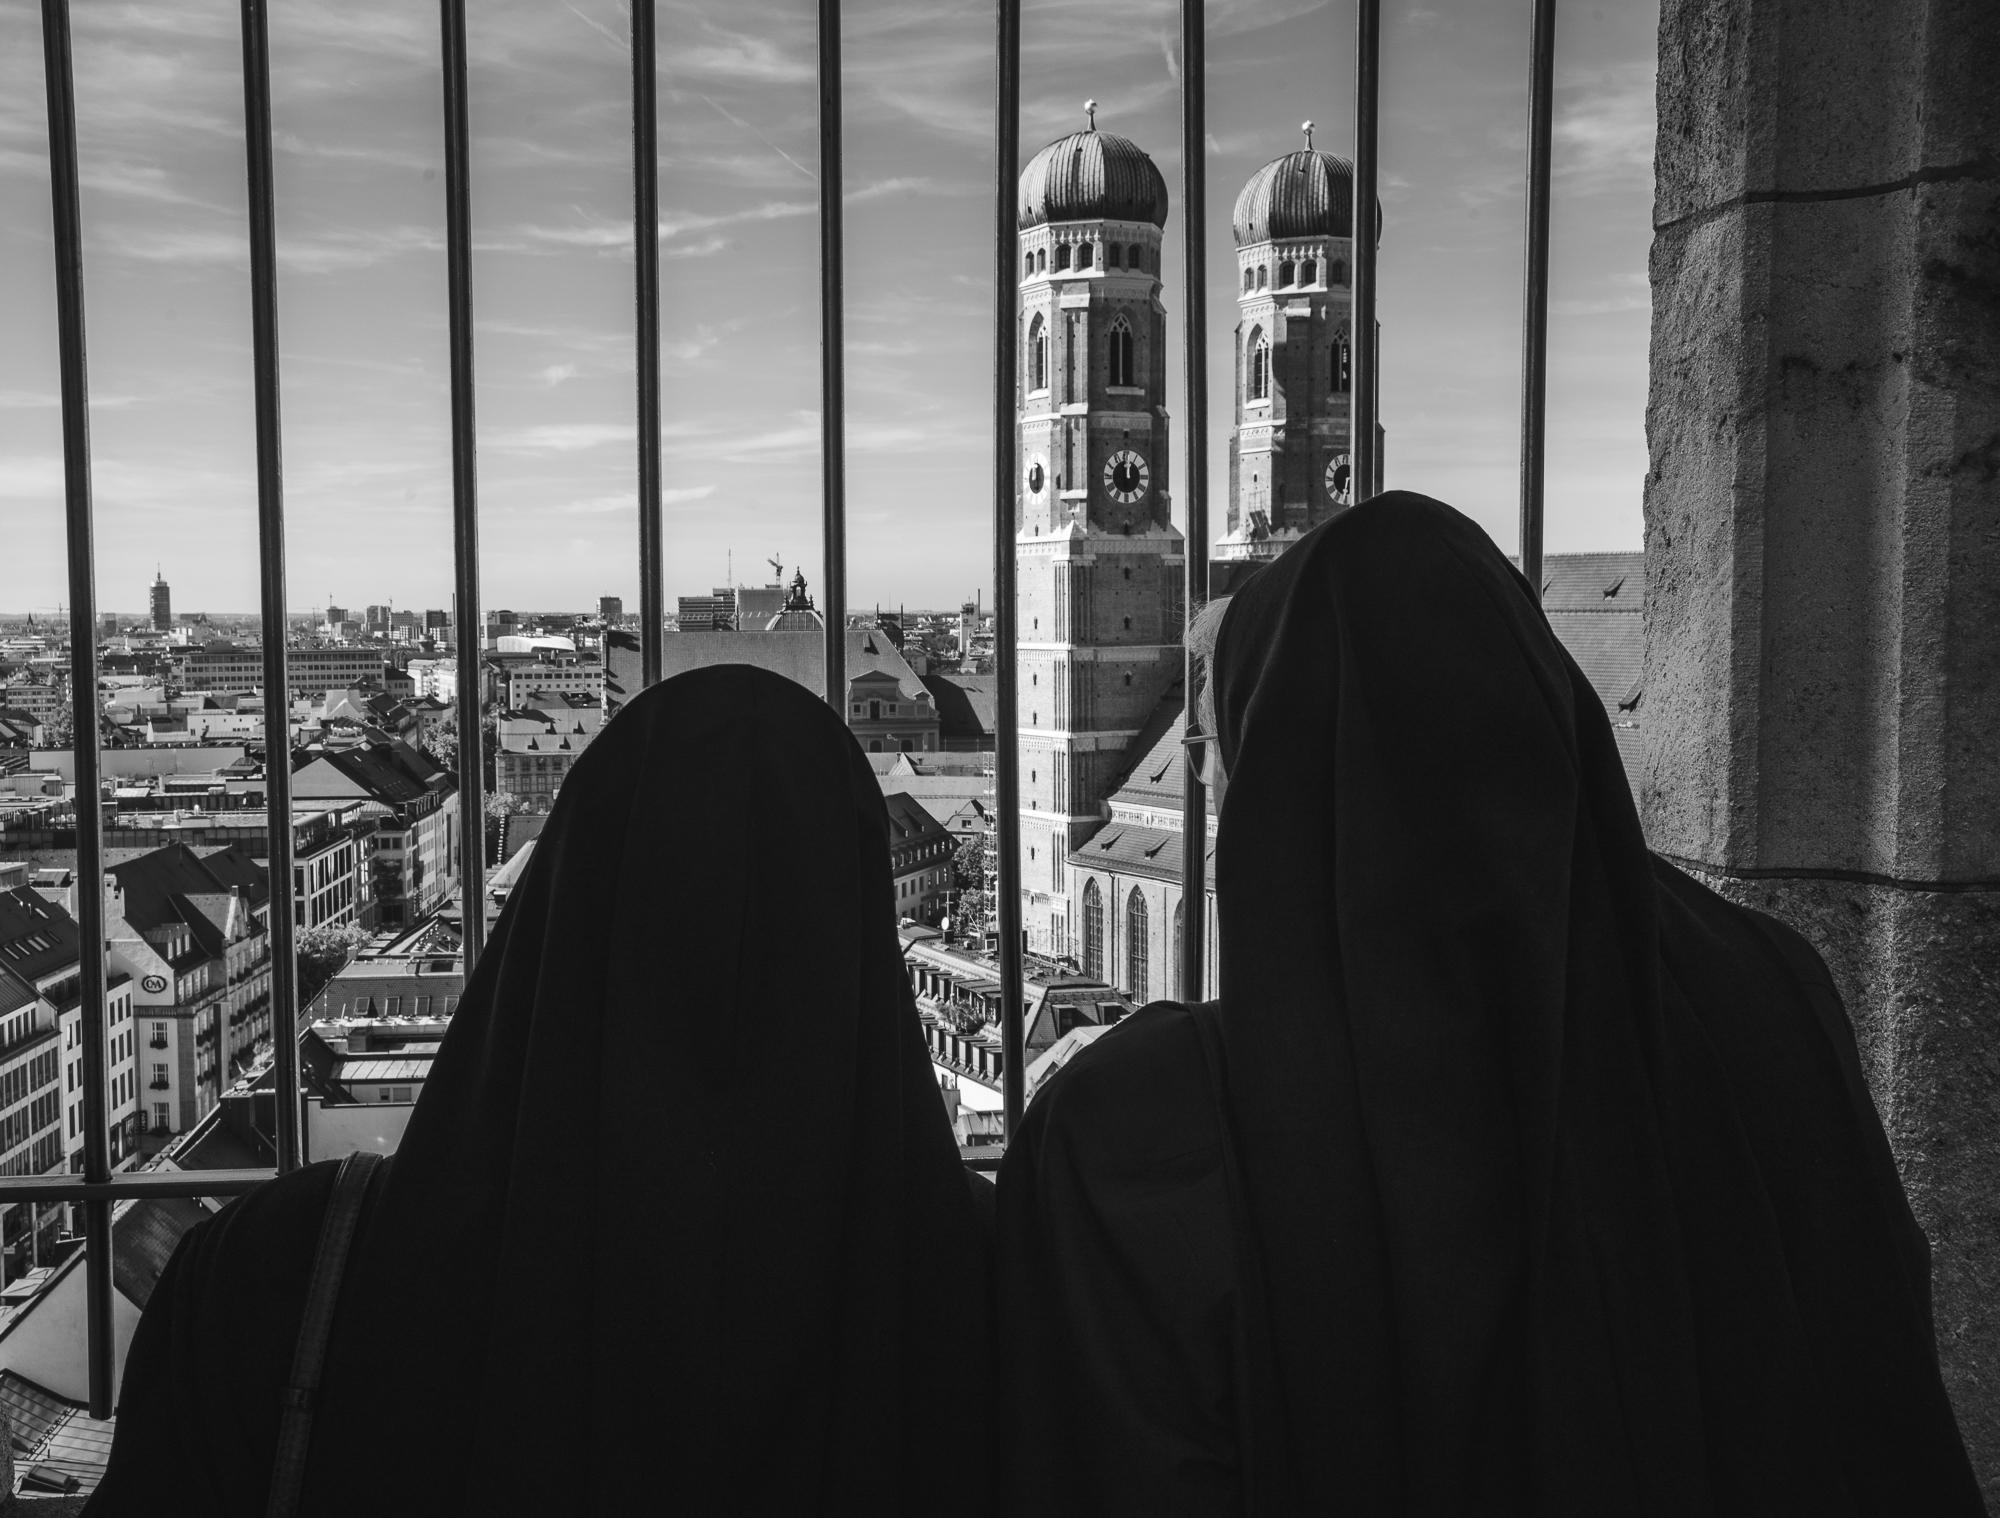 Nuns over Munich